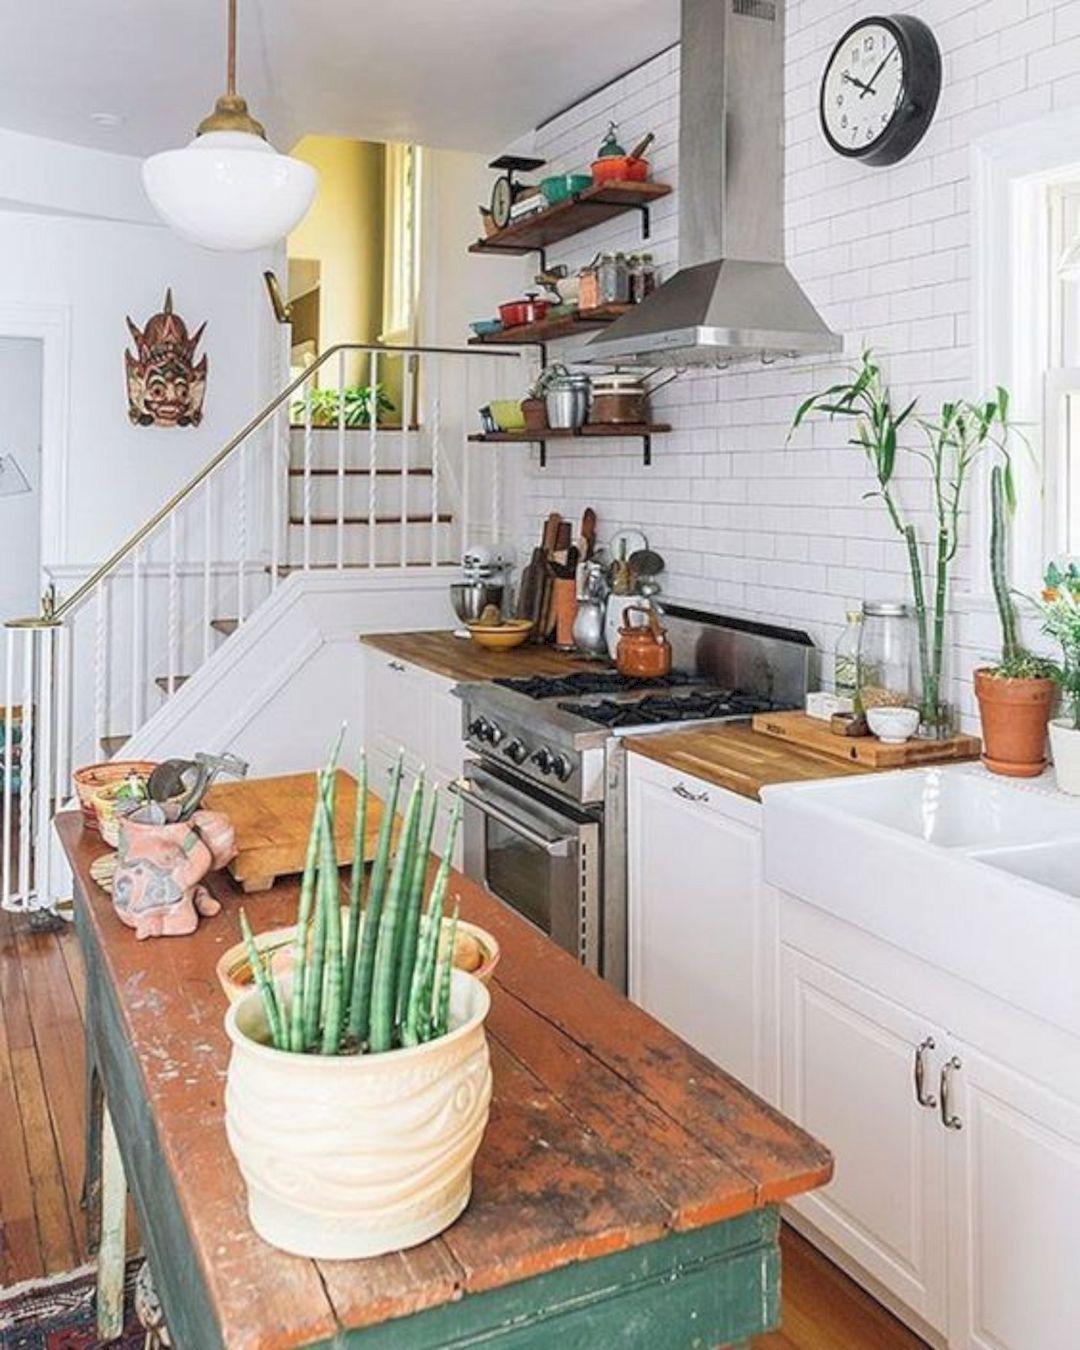 16 Small Cottage Interior Design Ideas Home Kitchens Cottage Kitchen Design Kitchen Inspirations